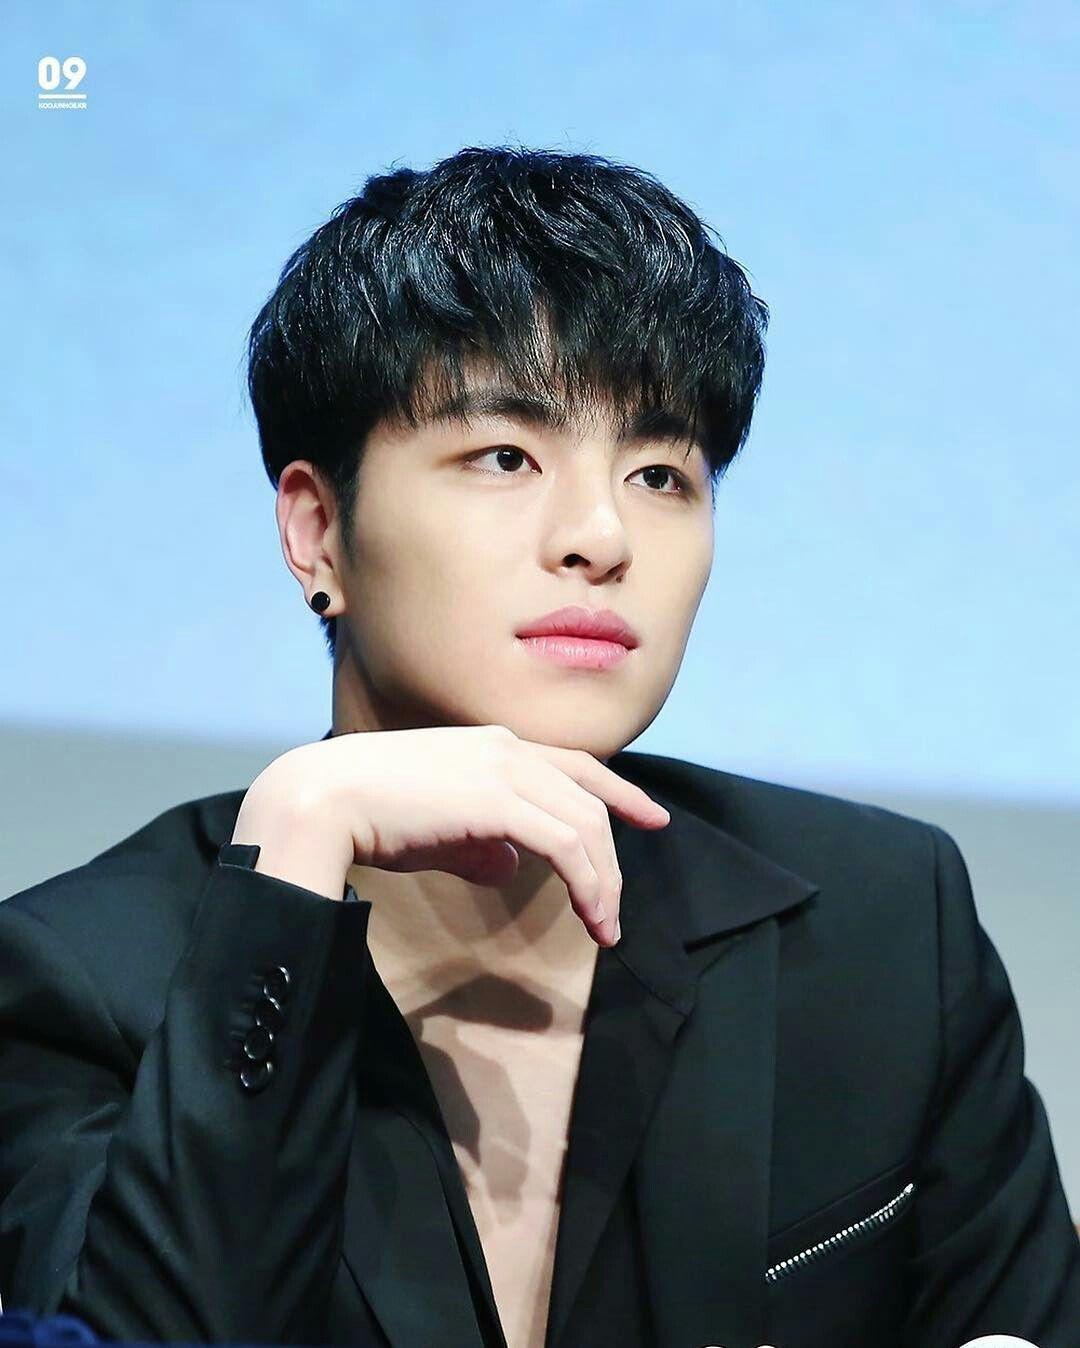 Jun Hoe June Ikon Ikon Junhoe Kpop Handsome Ikon Kpop Ikon Junhoe Ikon Member